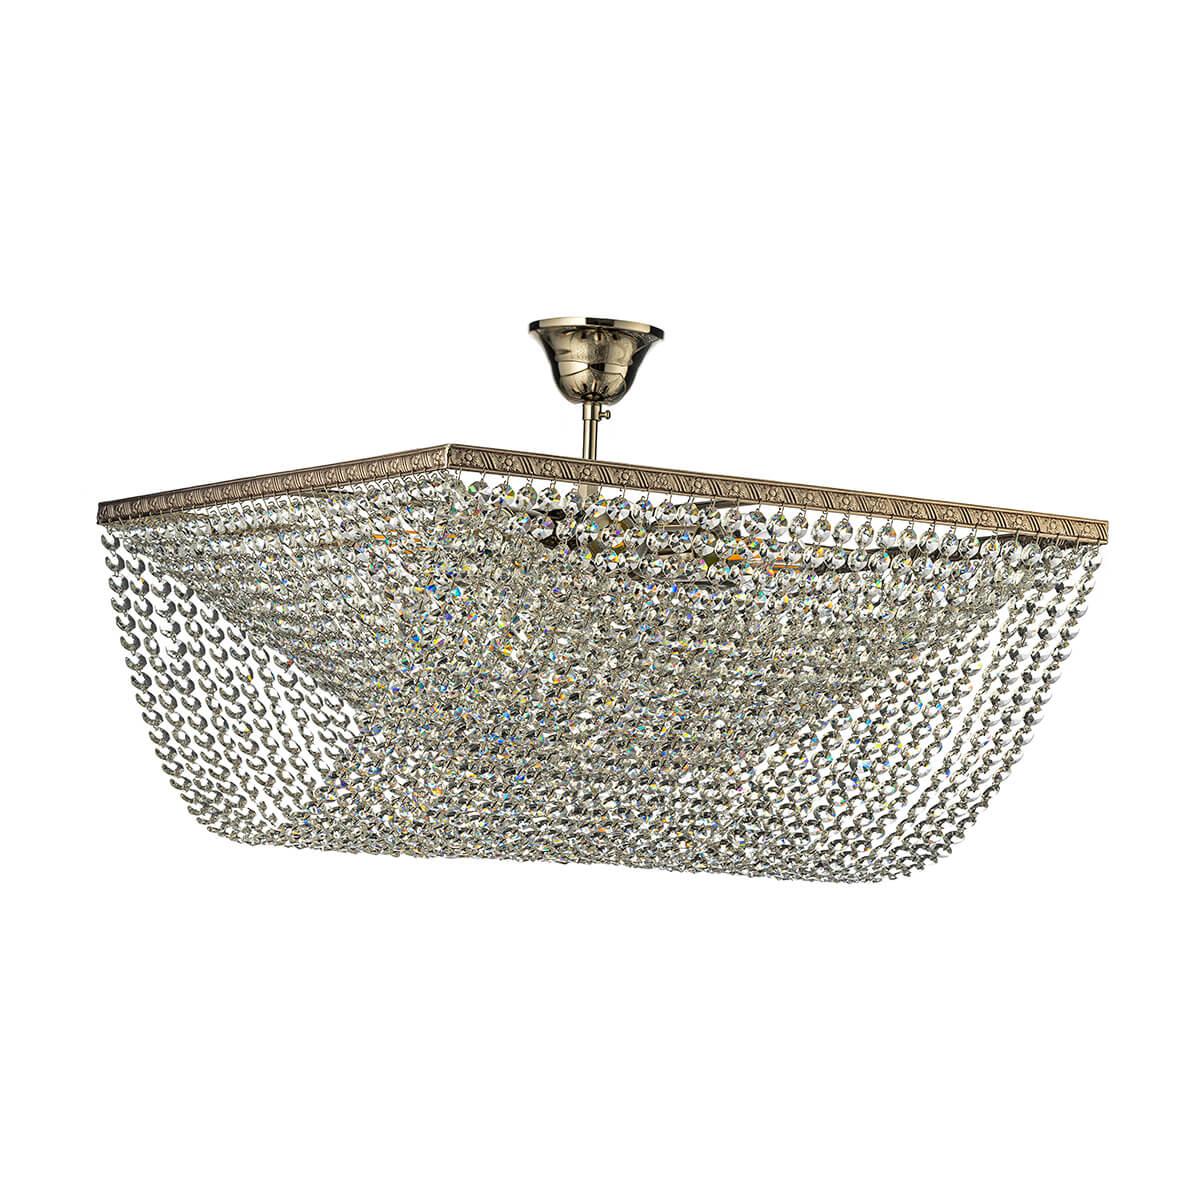 Потолочный светильник Arti Lampadari Nobile E 1.3.50.501 N